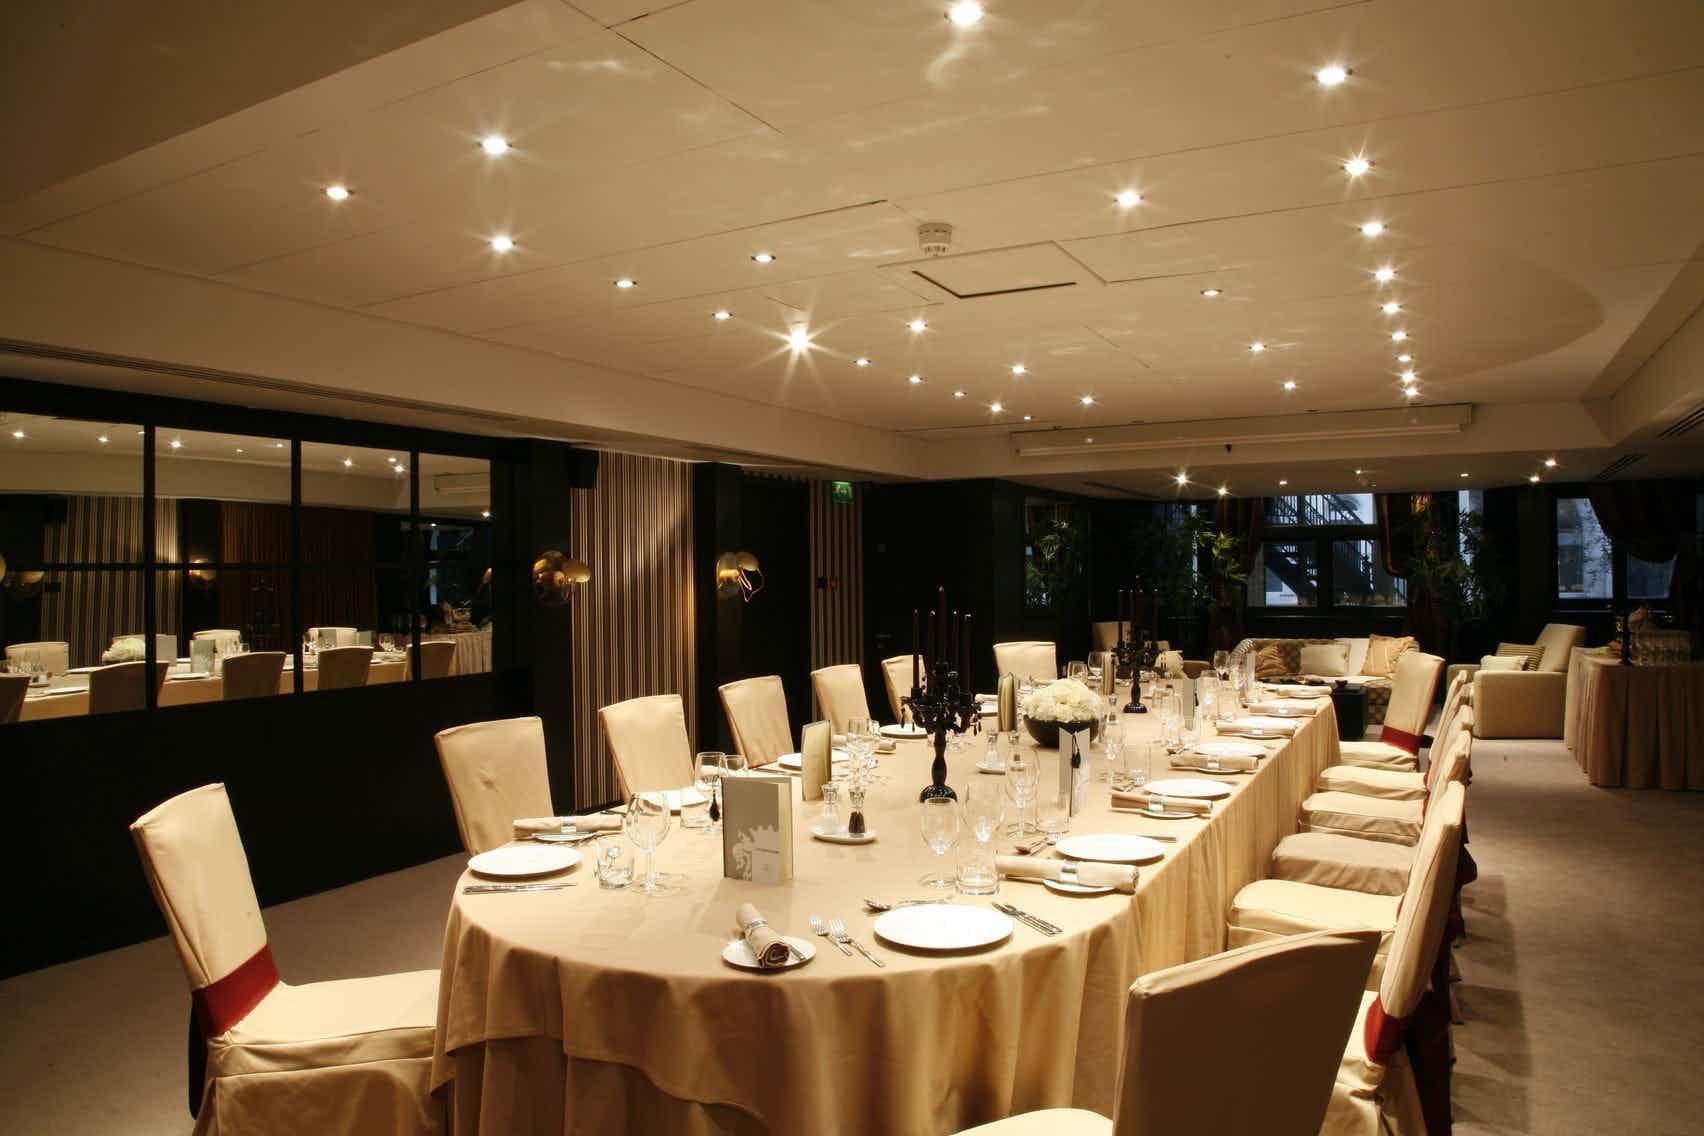 Kensington Suite Meeting Room, Baglioni Hotel London